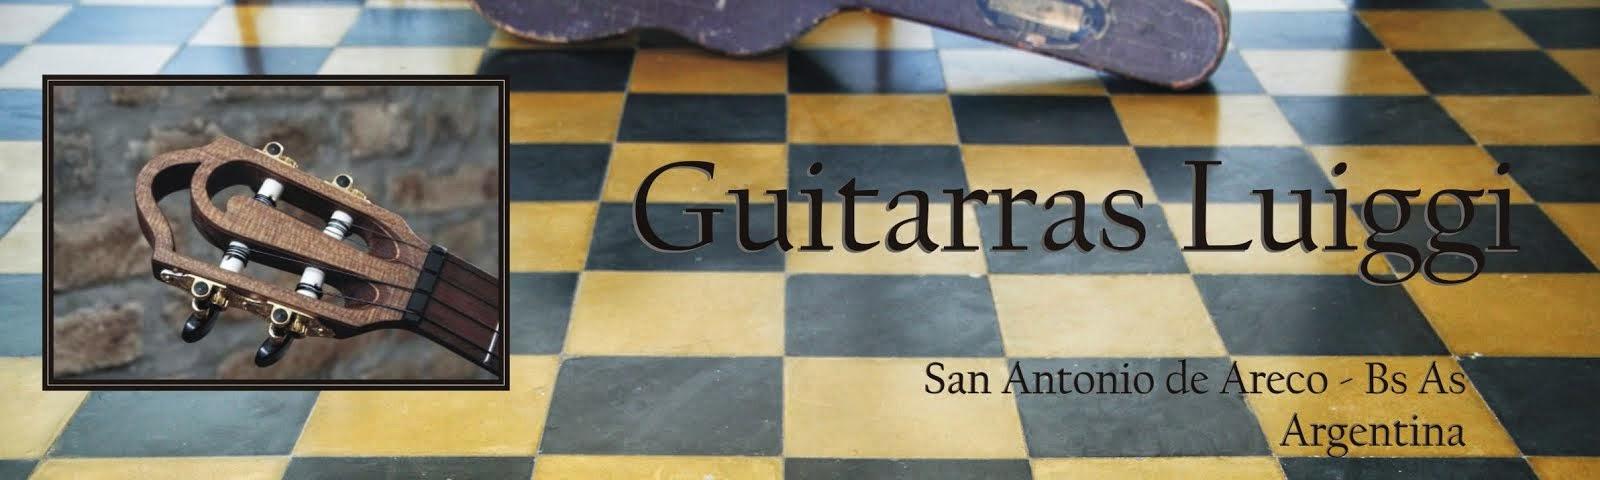 Guitarras Luiggi